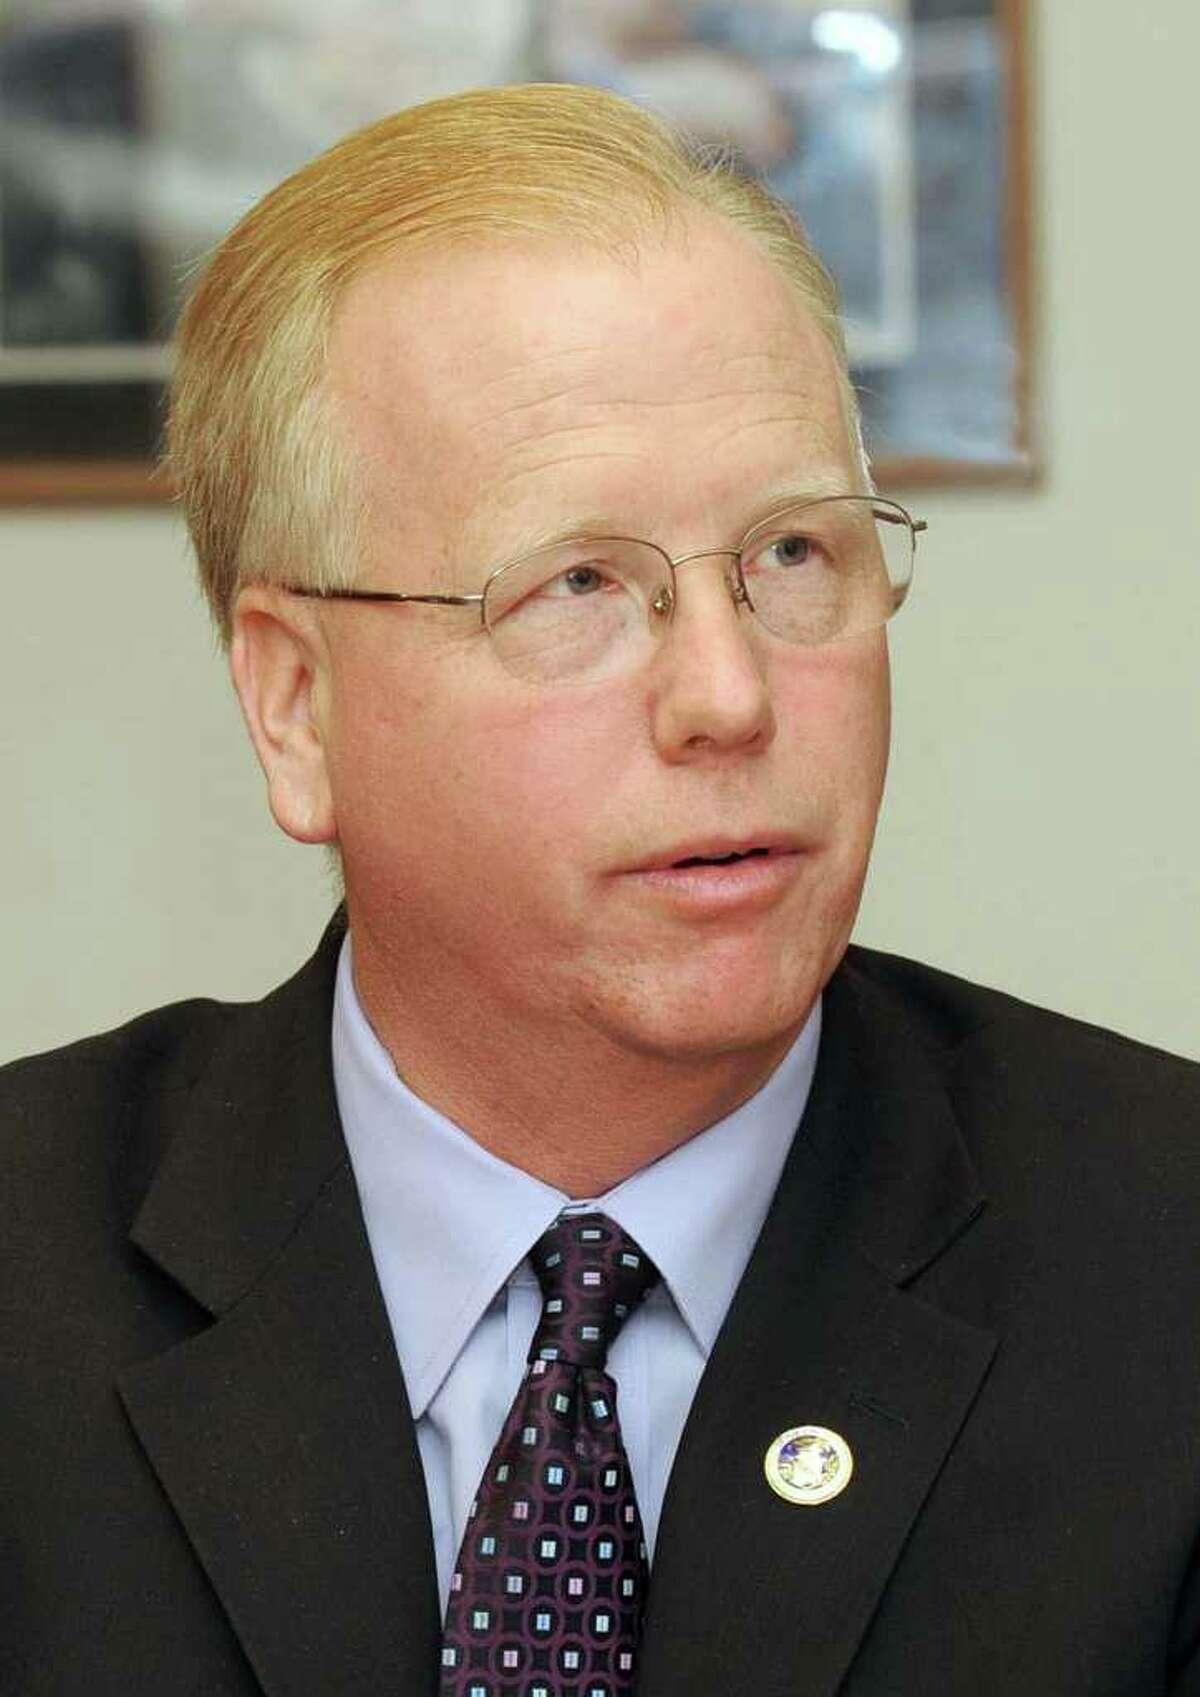 Mayor Mark Boughton of Danbury